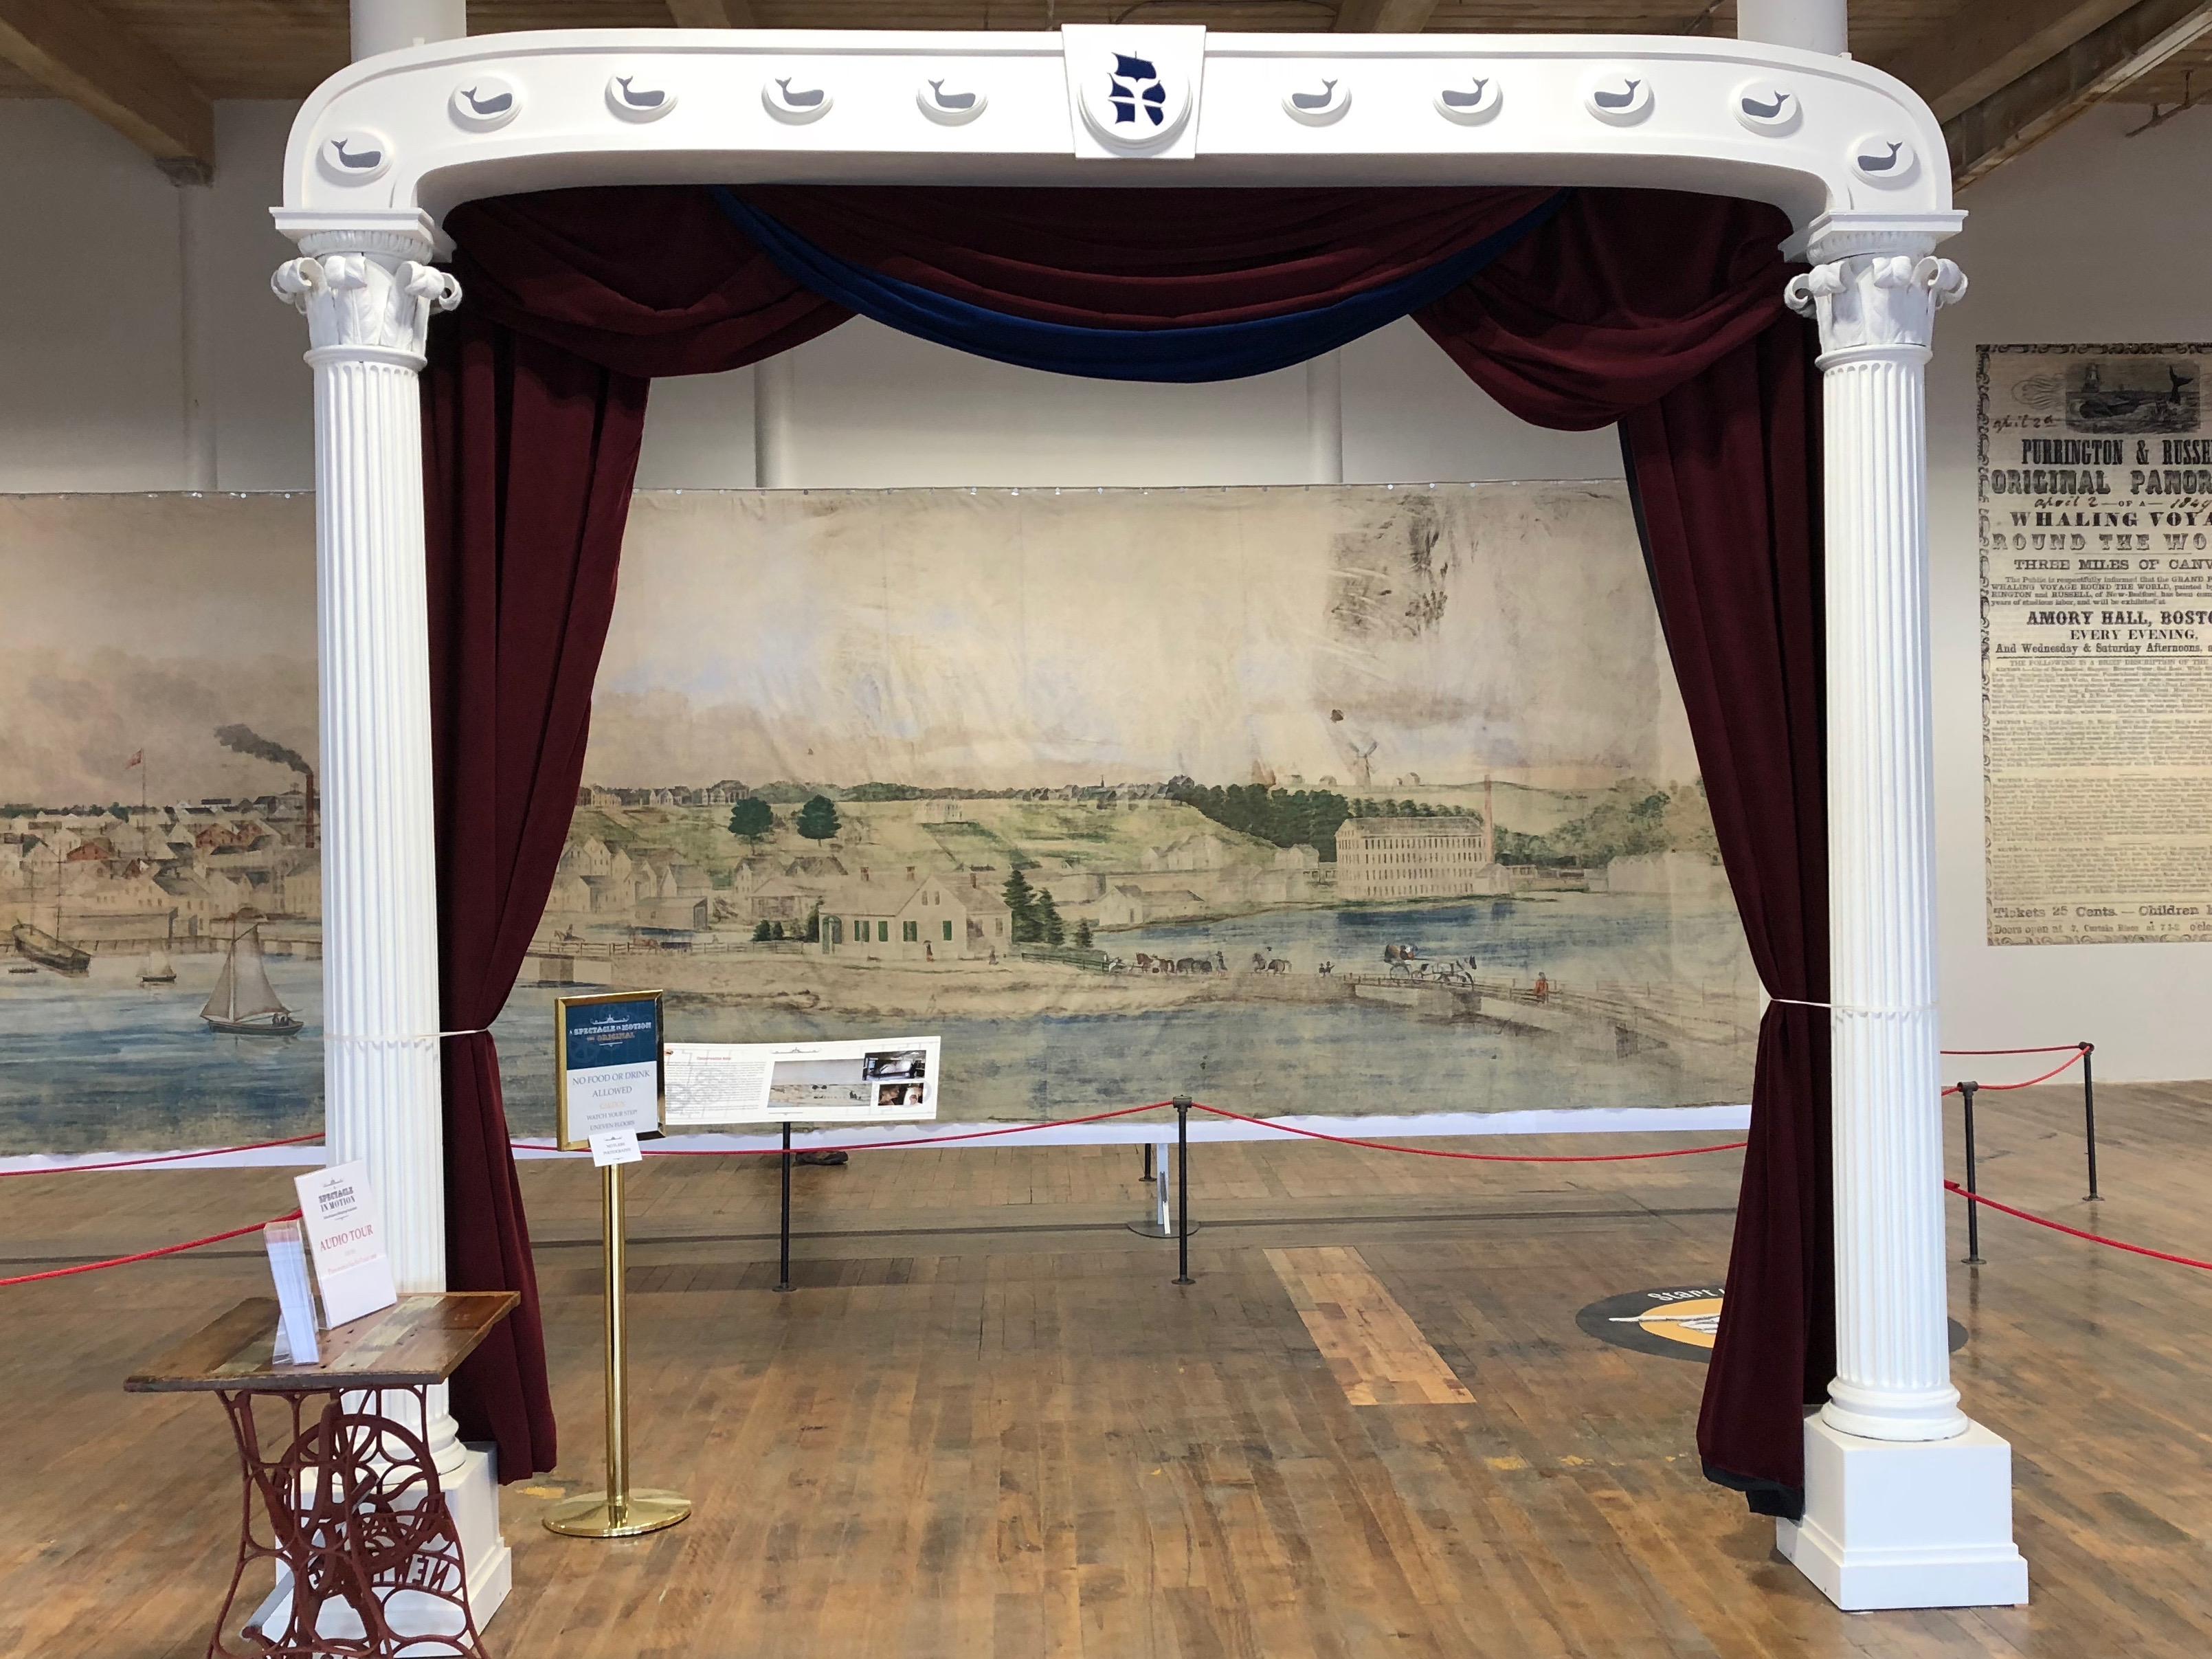 092518-exhibit-entrance-mimics-scrolling-frame